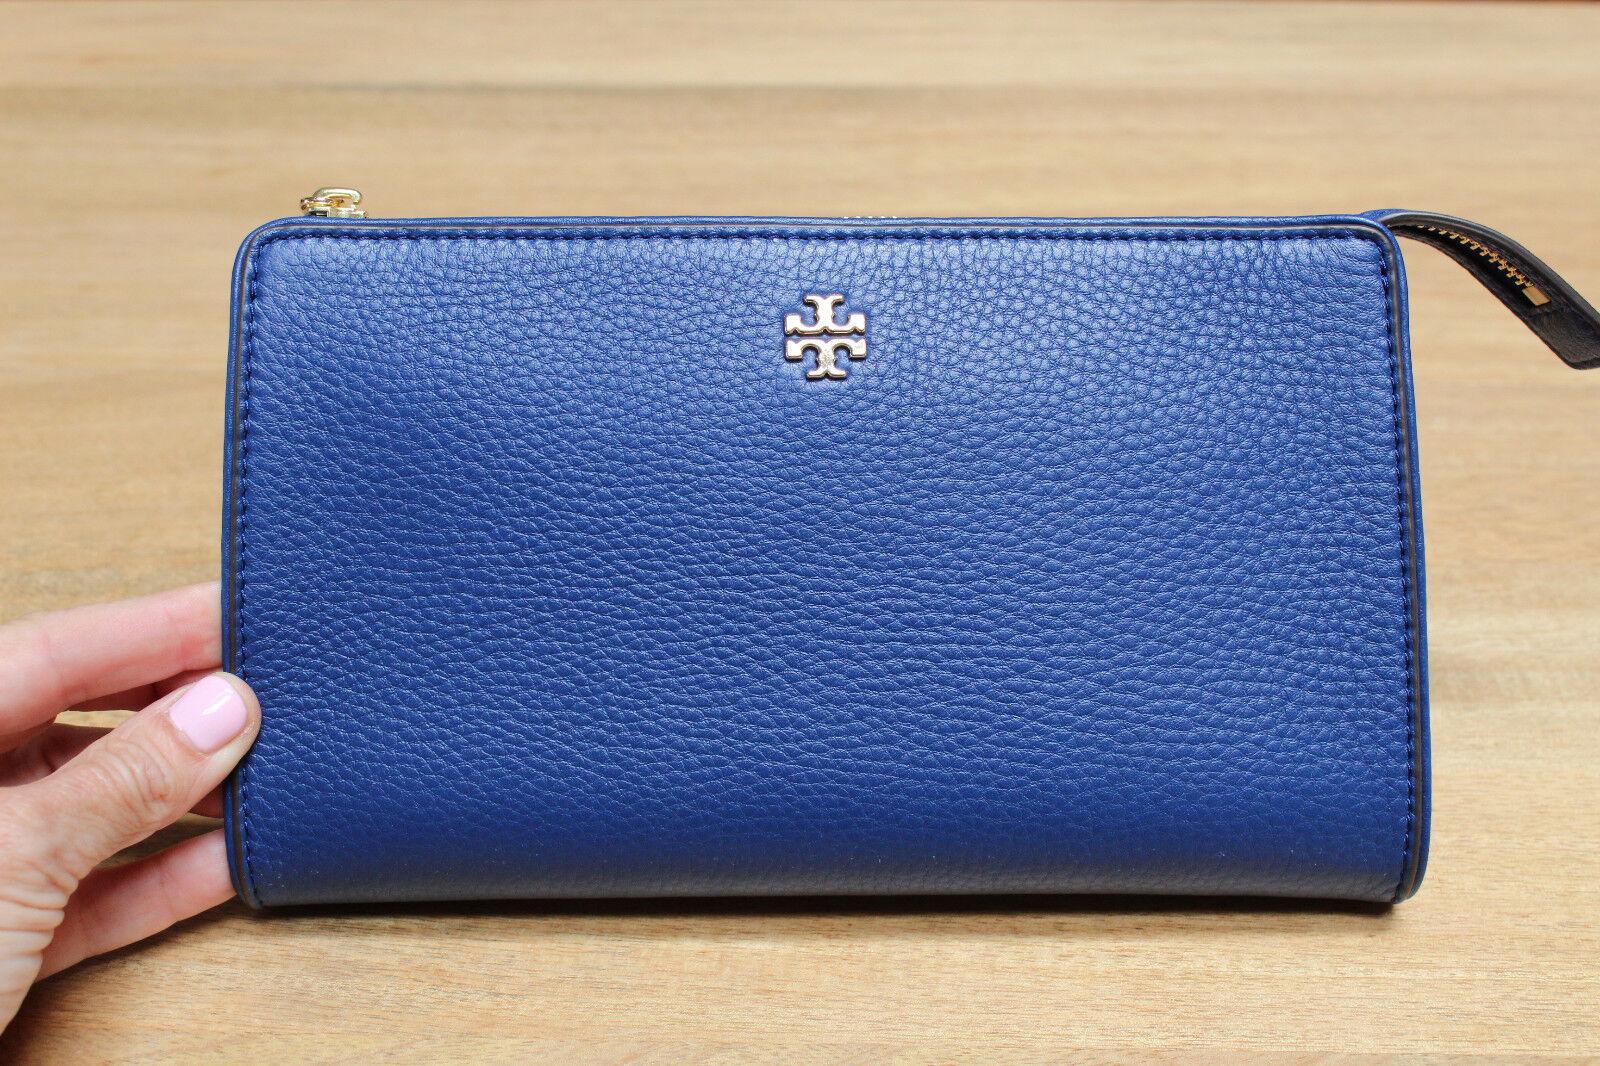 8cc558dcc8b Tory Burch Marsden Leather Wallet Crossbody Bag Fresh Blueberry ...